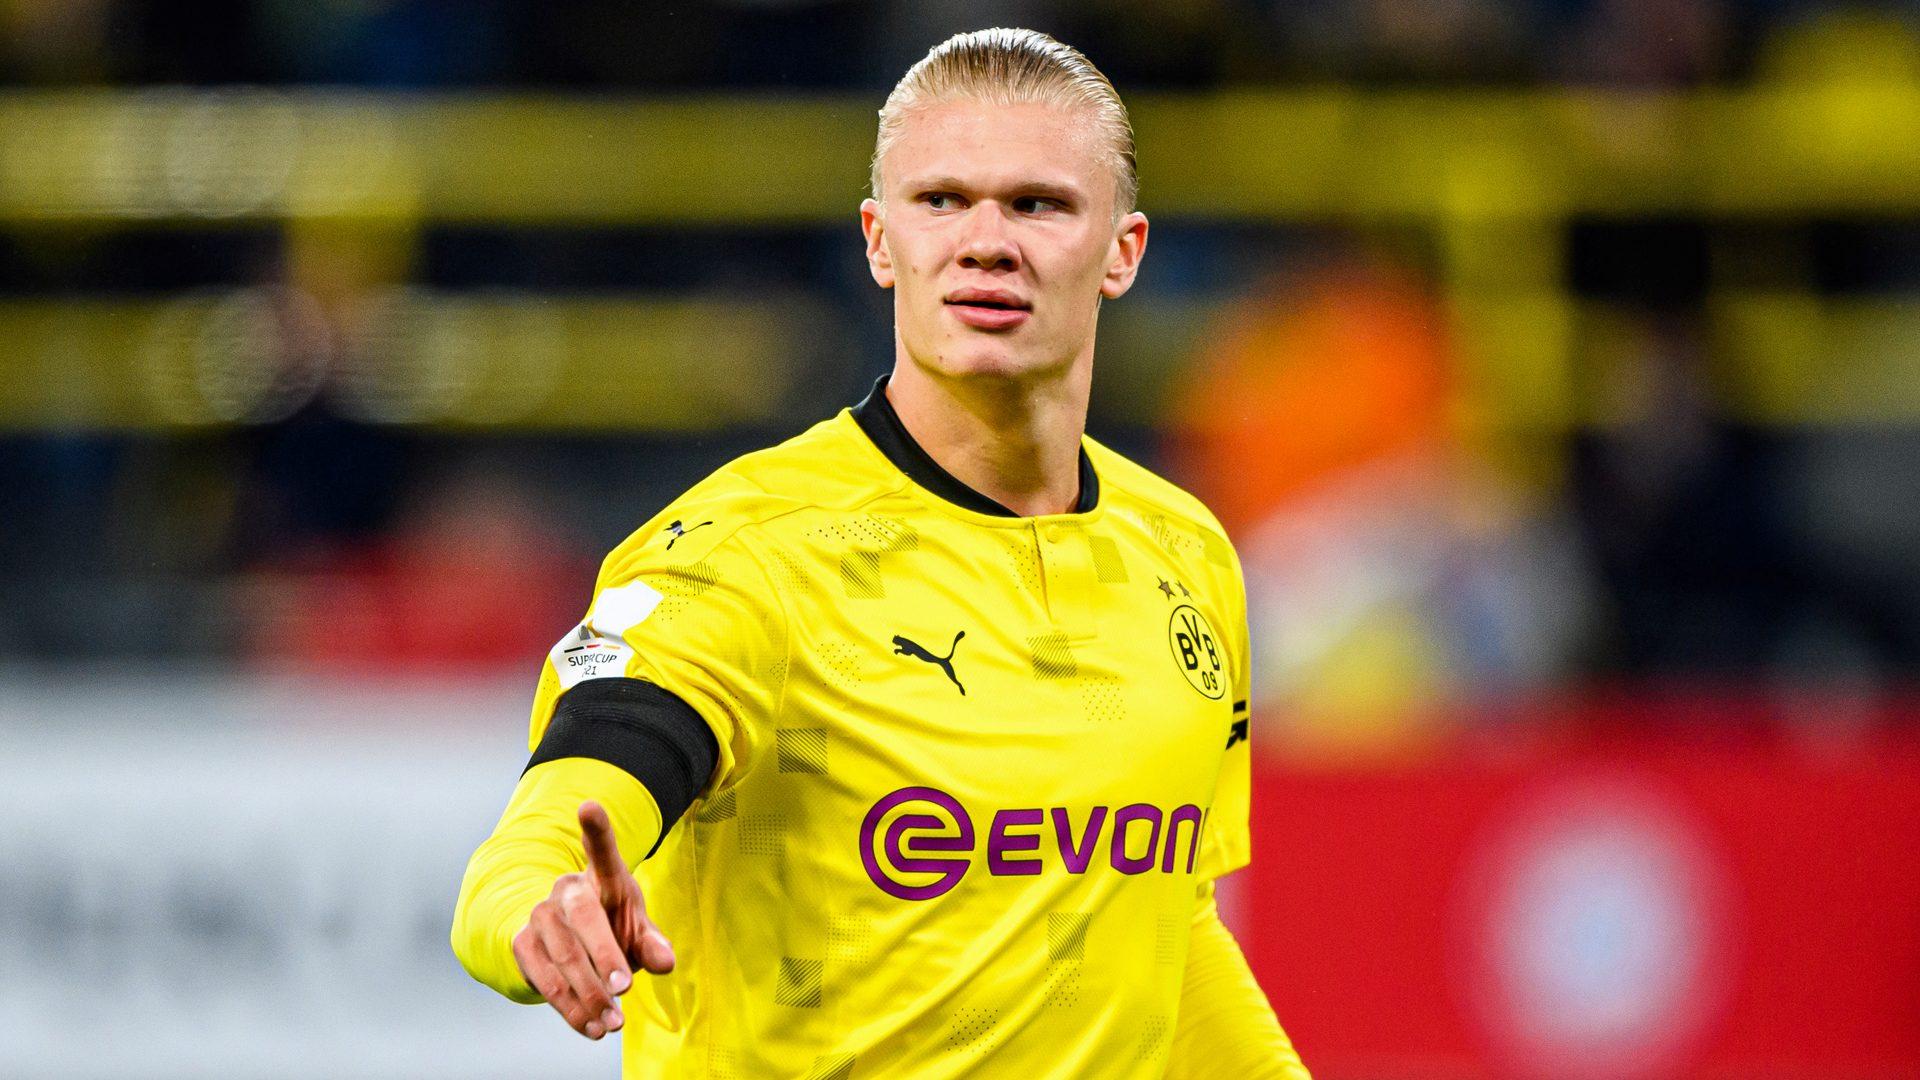 5 reasons Dortmund will beat Besiktas in the Champions League